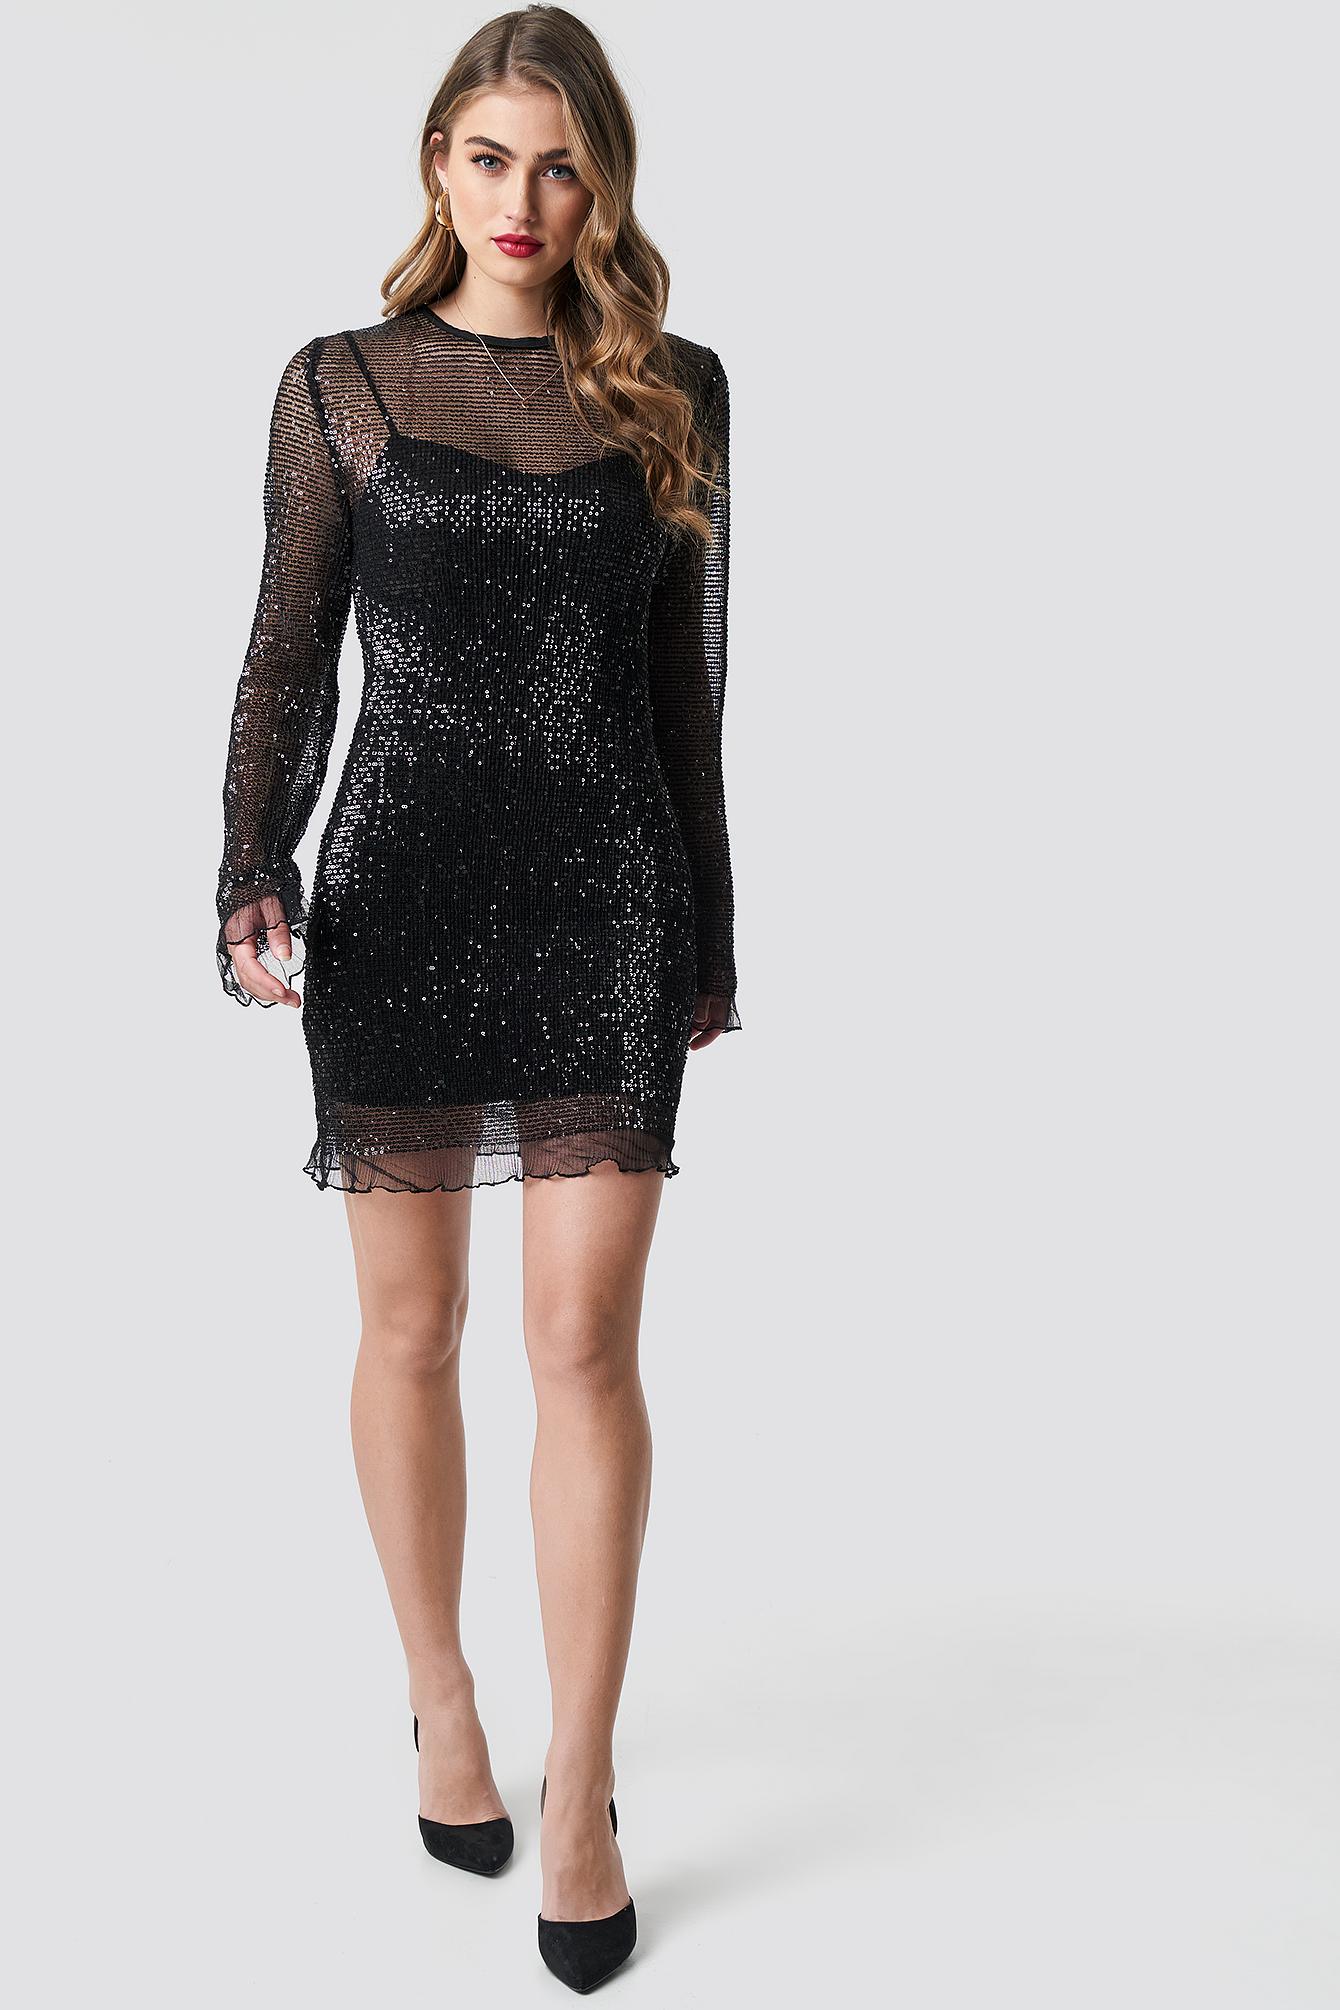 LS Sequin Transparence Dress NA-KD.COM